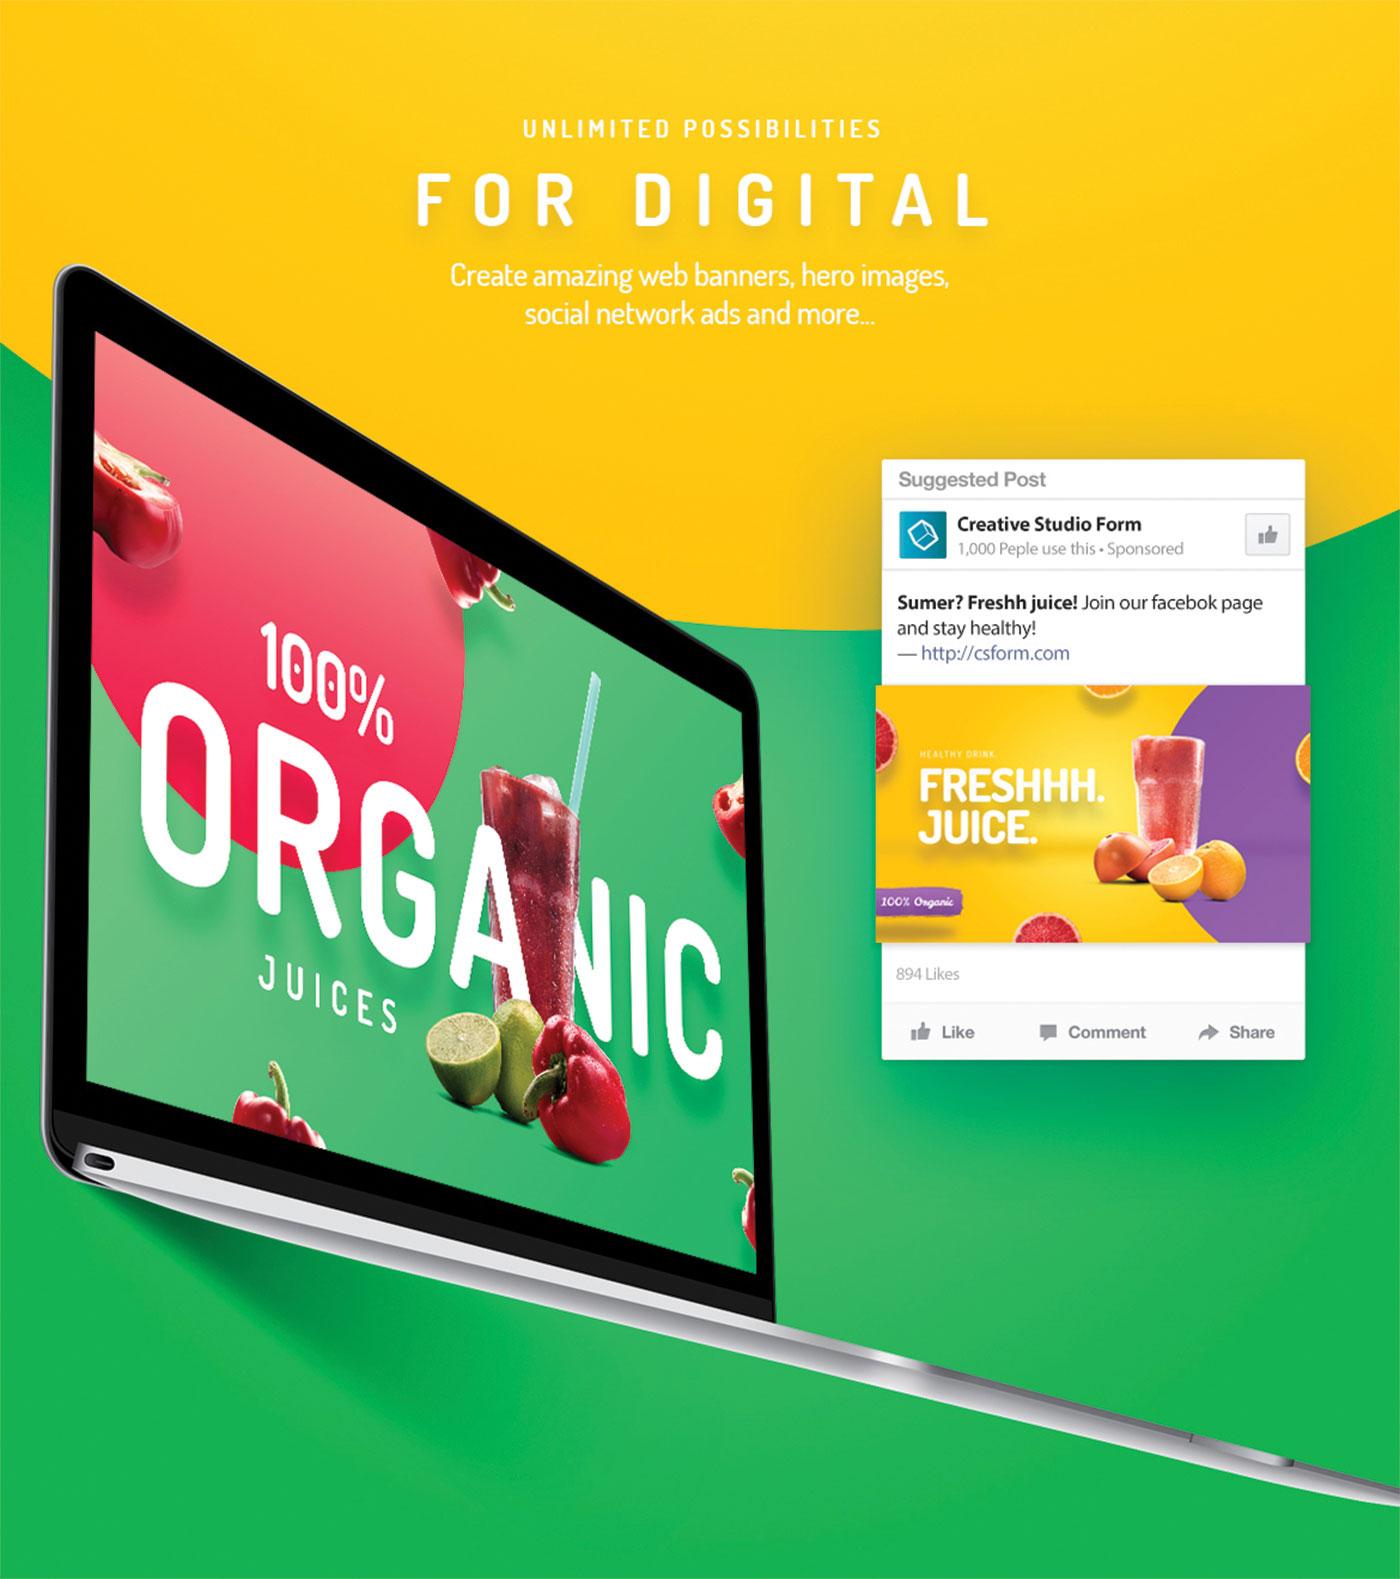 Organic juice and laptop